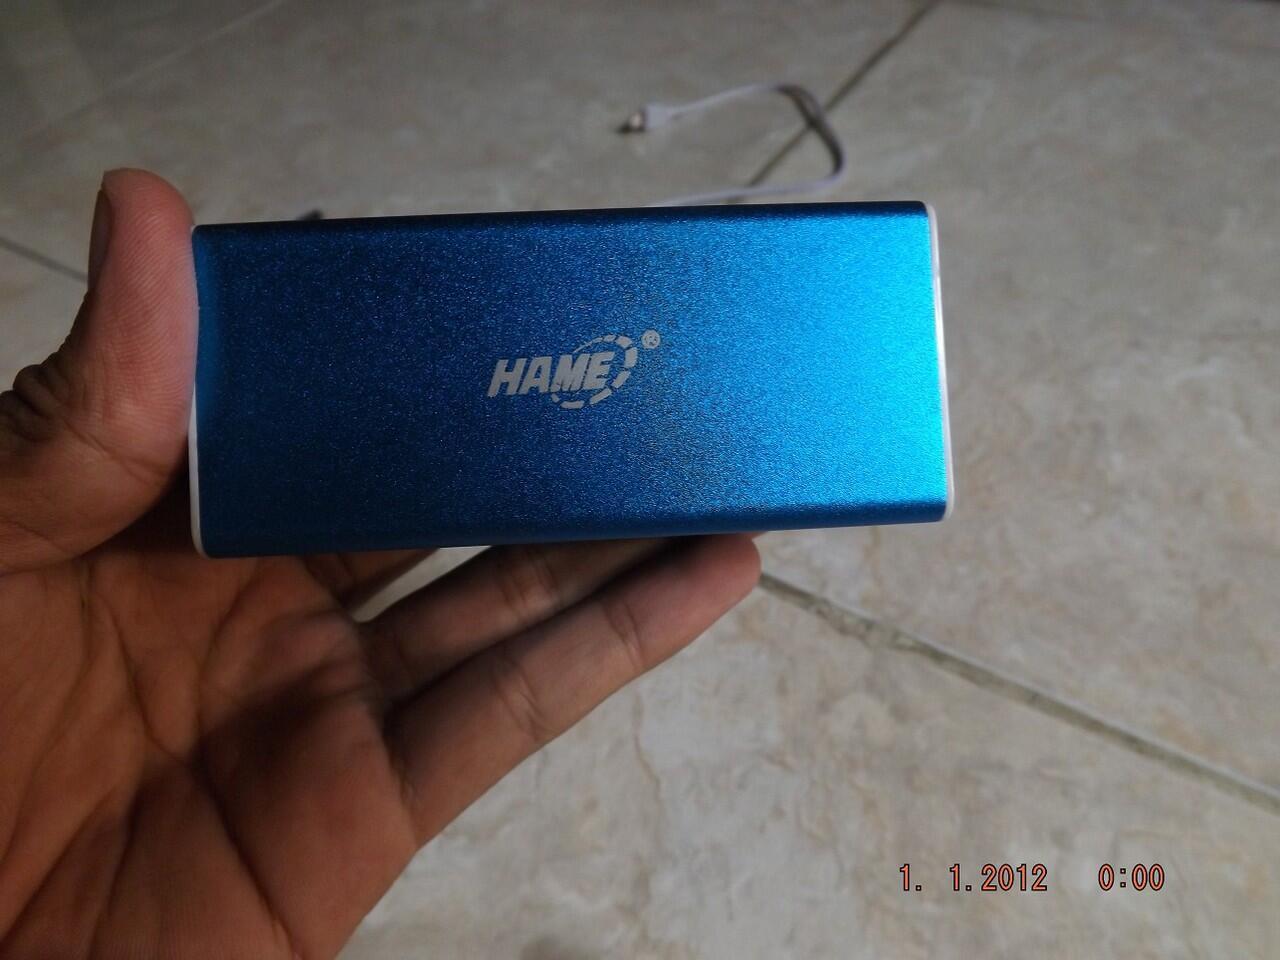 Power bank Hame 10400mAh murah, cek dulu